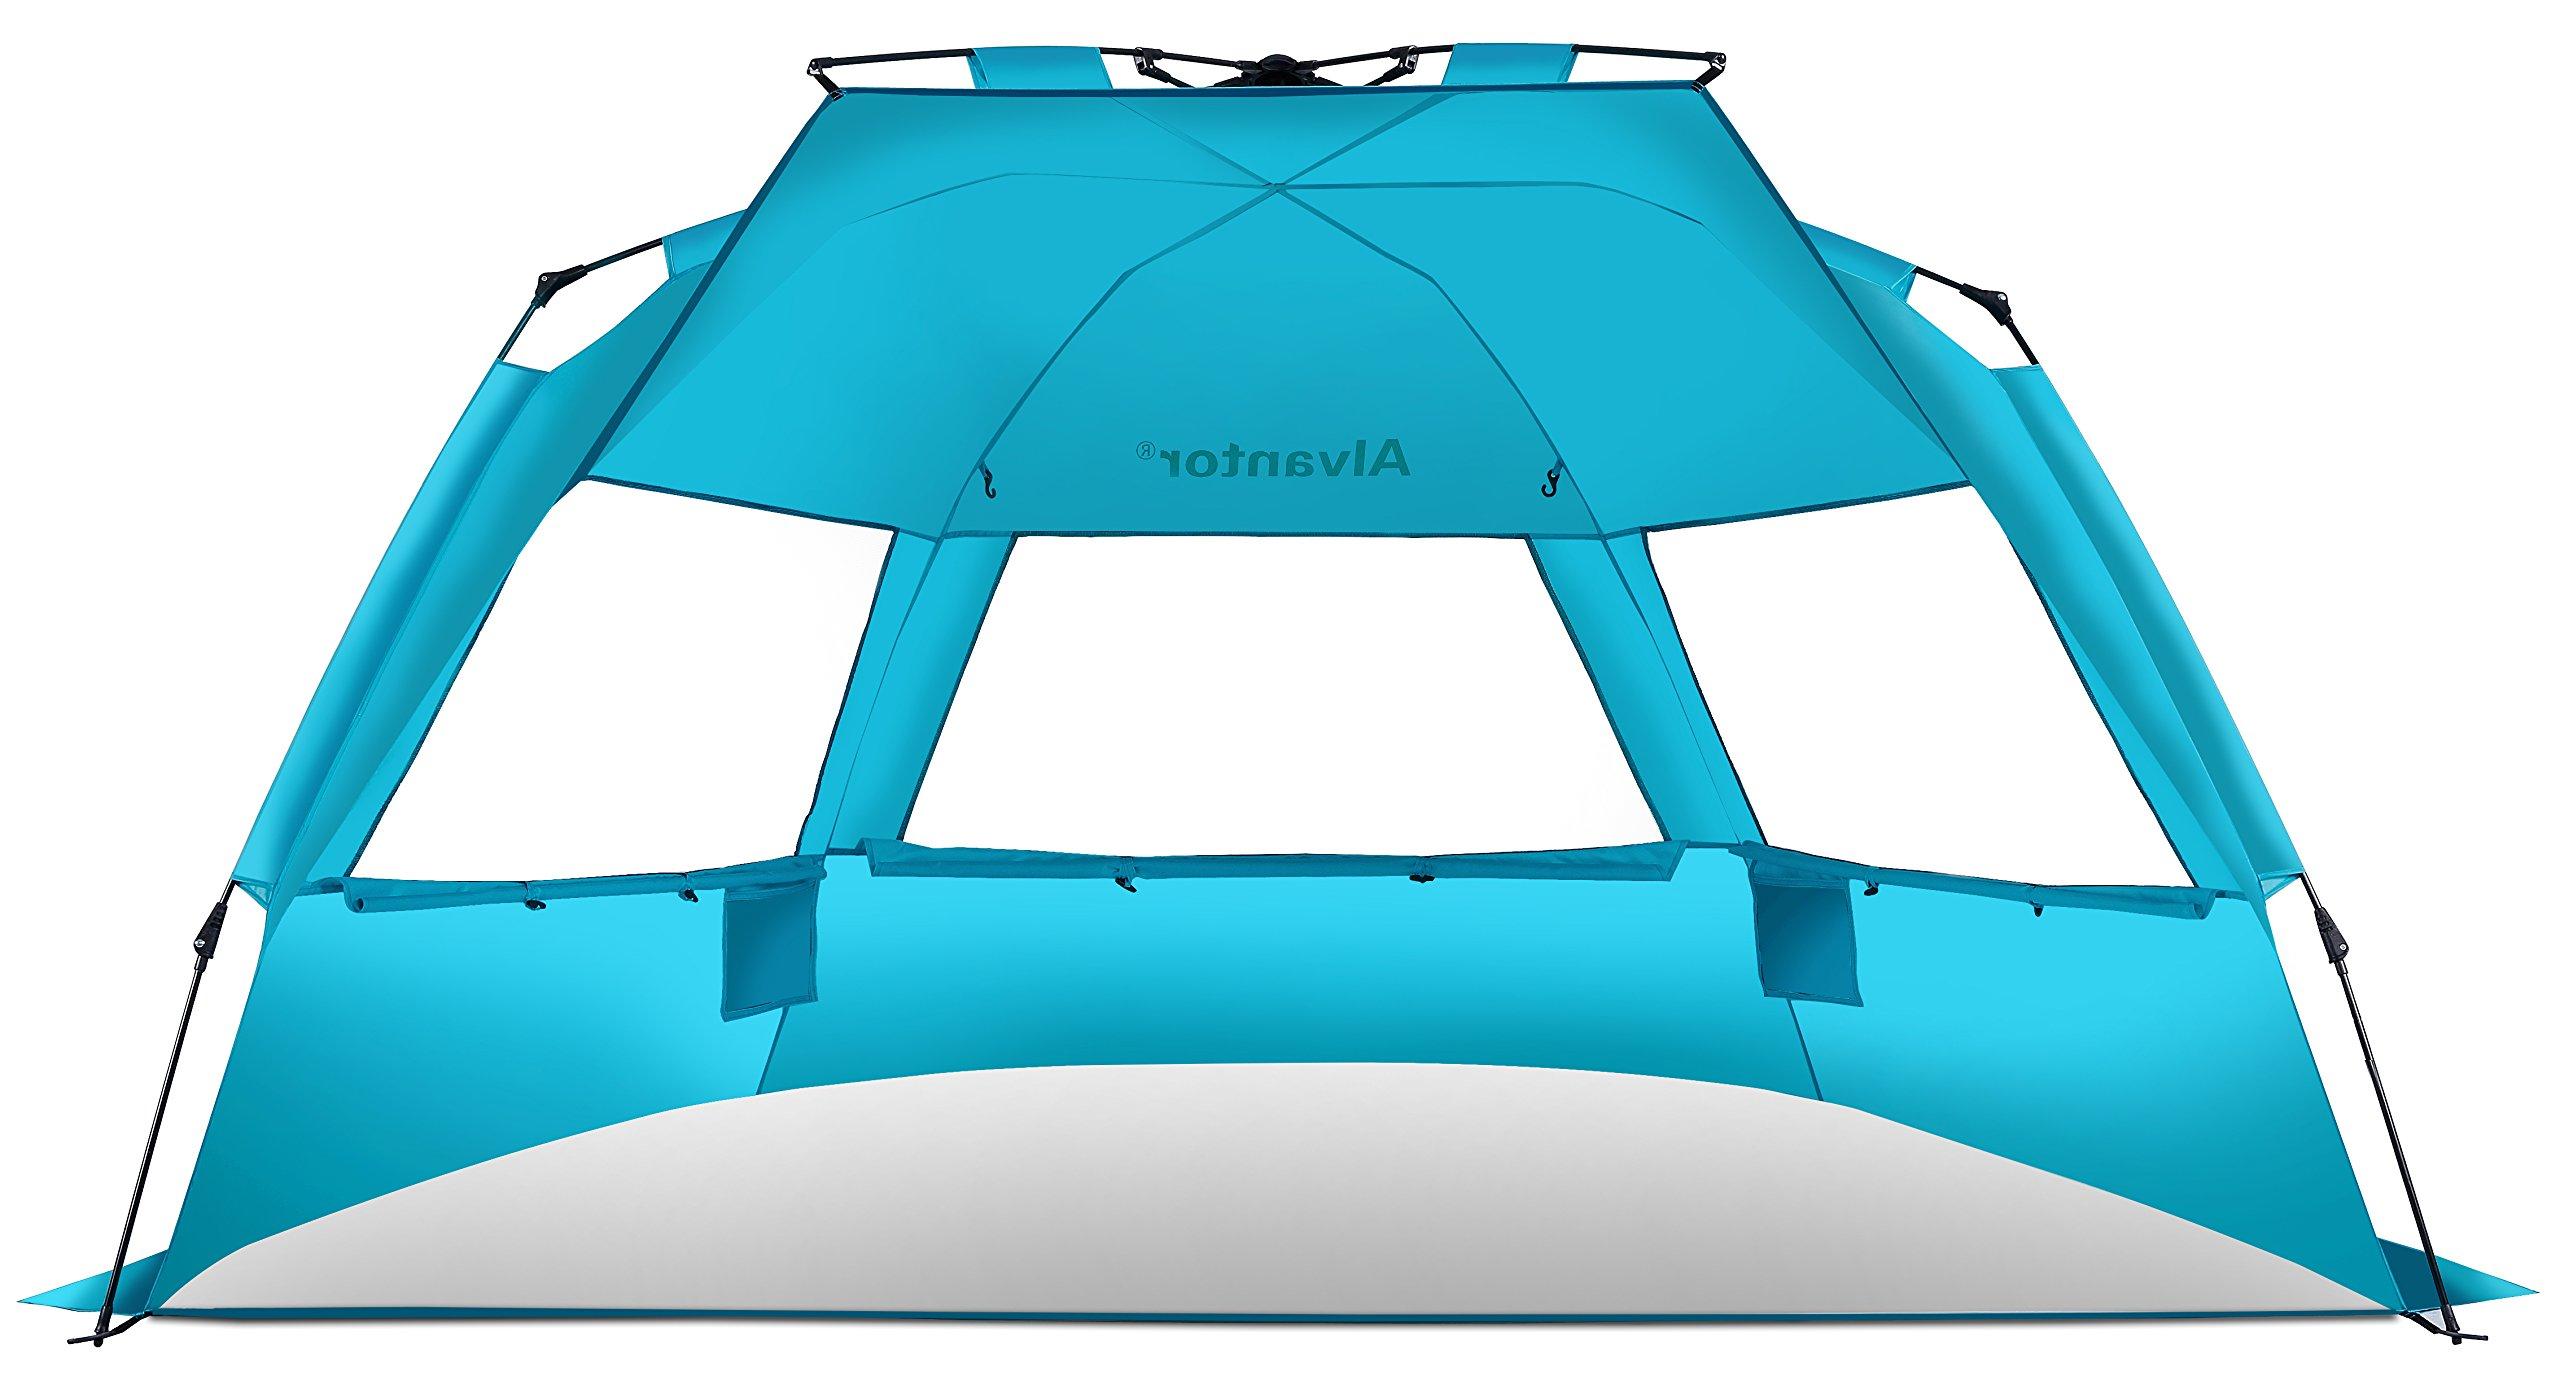 Alvantor Beach Tent Super Bluecoast Beach Umbrella Outdoor Sun Shelter Cabana Automatic Pop Up UPF 50+ Sun Shade Portable Camping Hiking Canopy Easy Setup Windproof Patent Pending 3 or 4 Person